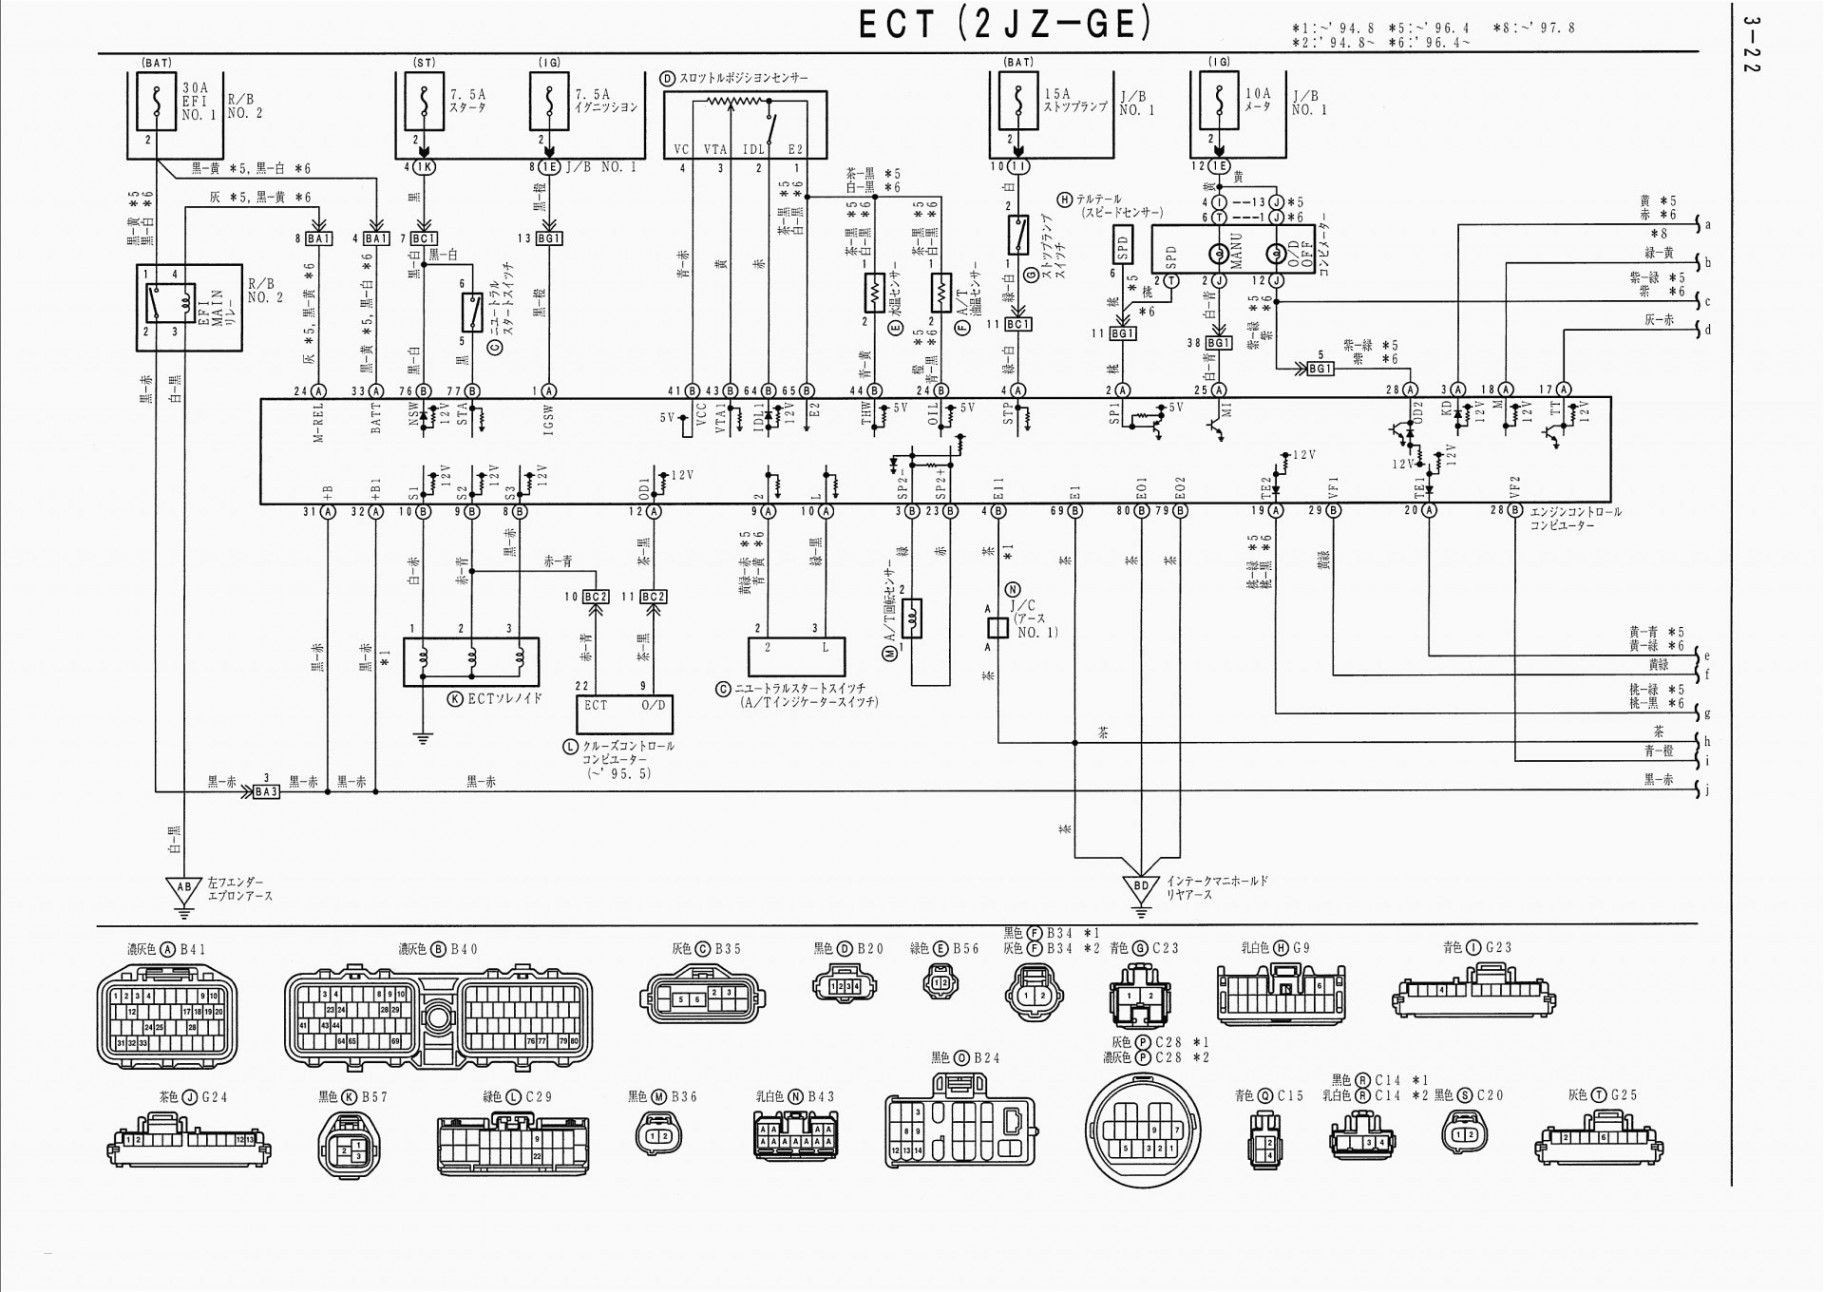 5.9 Cummins Diesel Engine Diagram Diagram Diagramsample Diagramformat Of 5.9 Cummins Diesel Engine Diagram